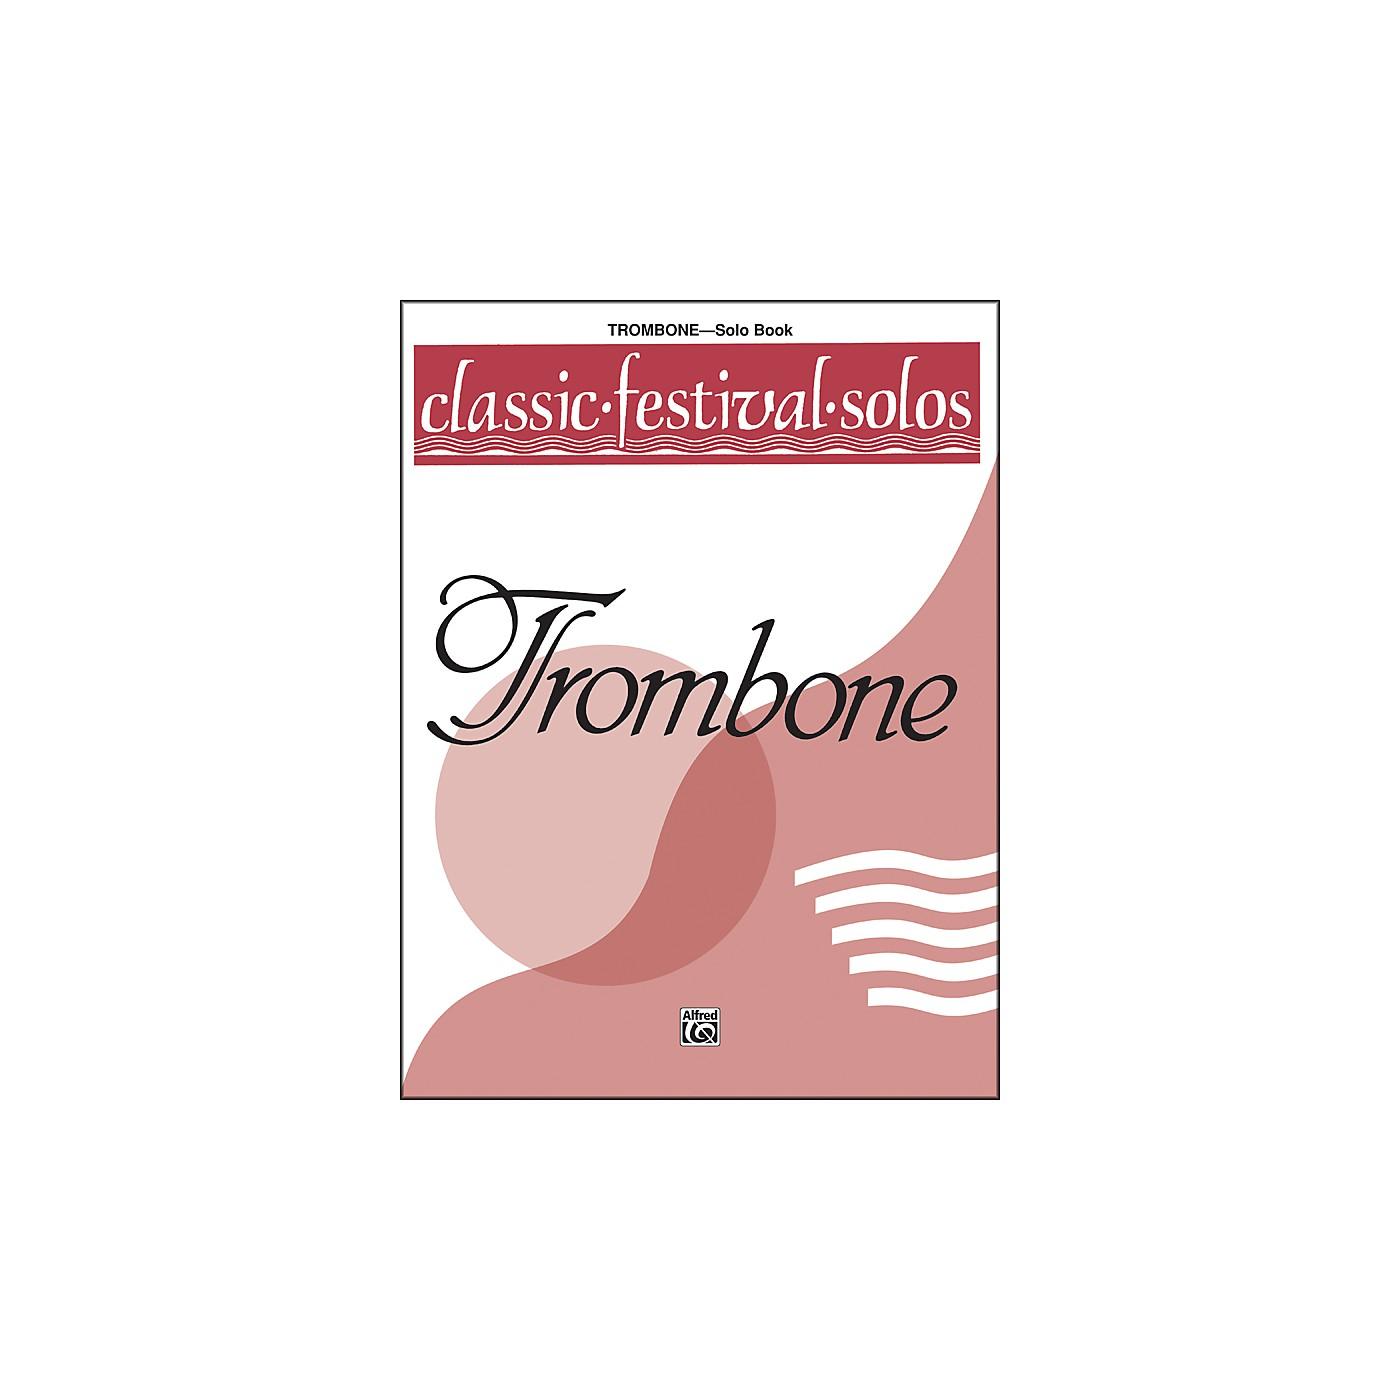 Alfred Classic Festival Solos (Trombone) Volume 1 Solo Book thumbnail